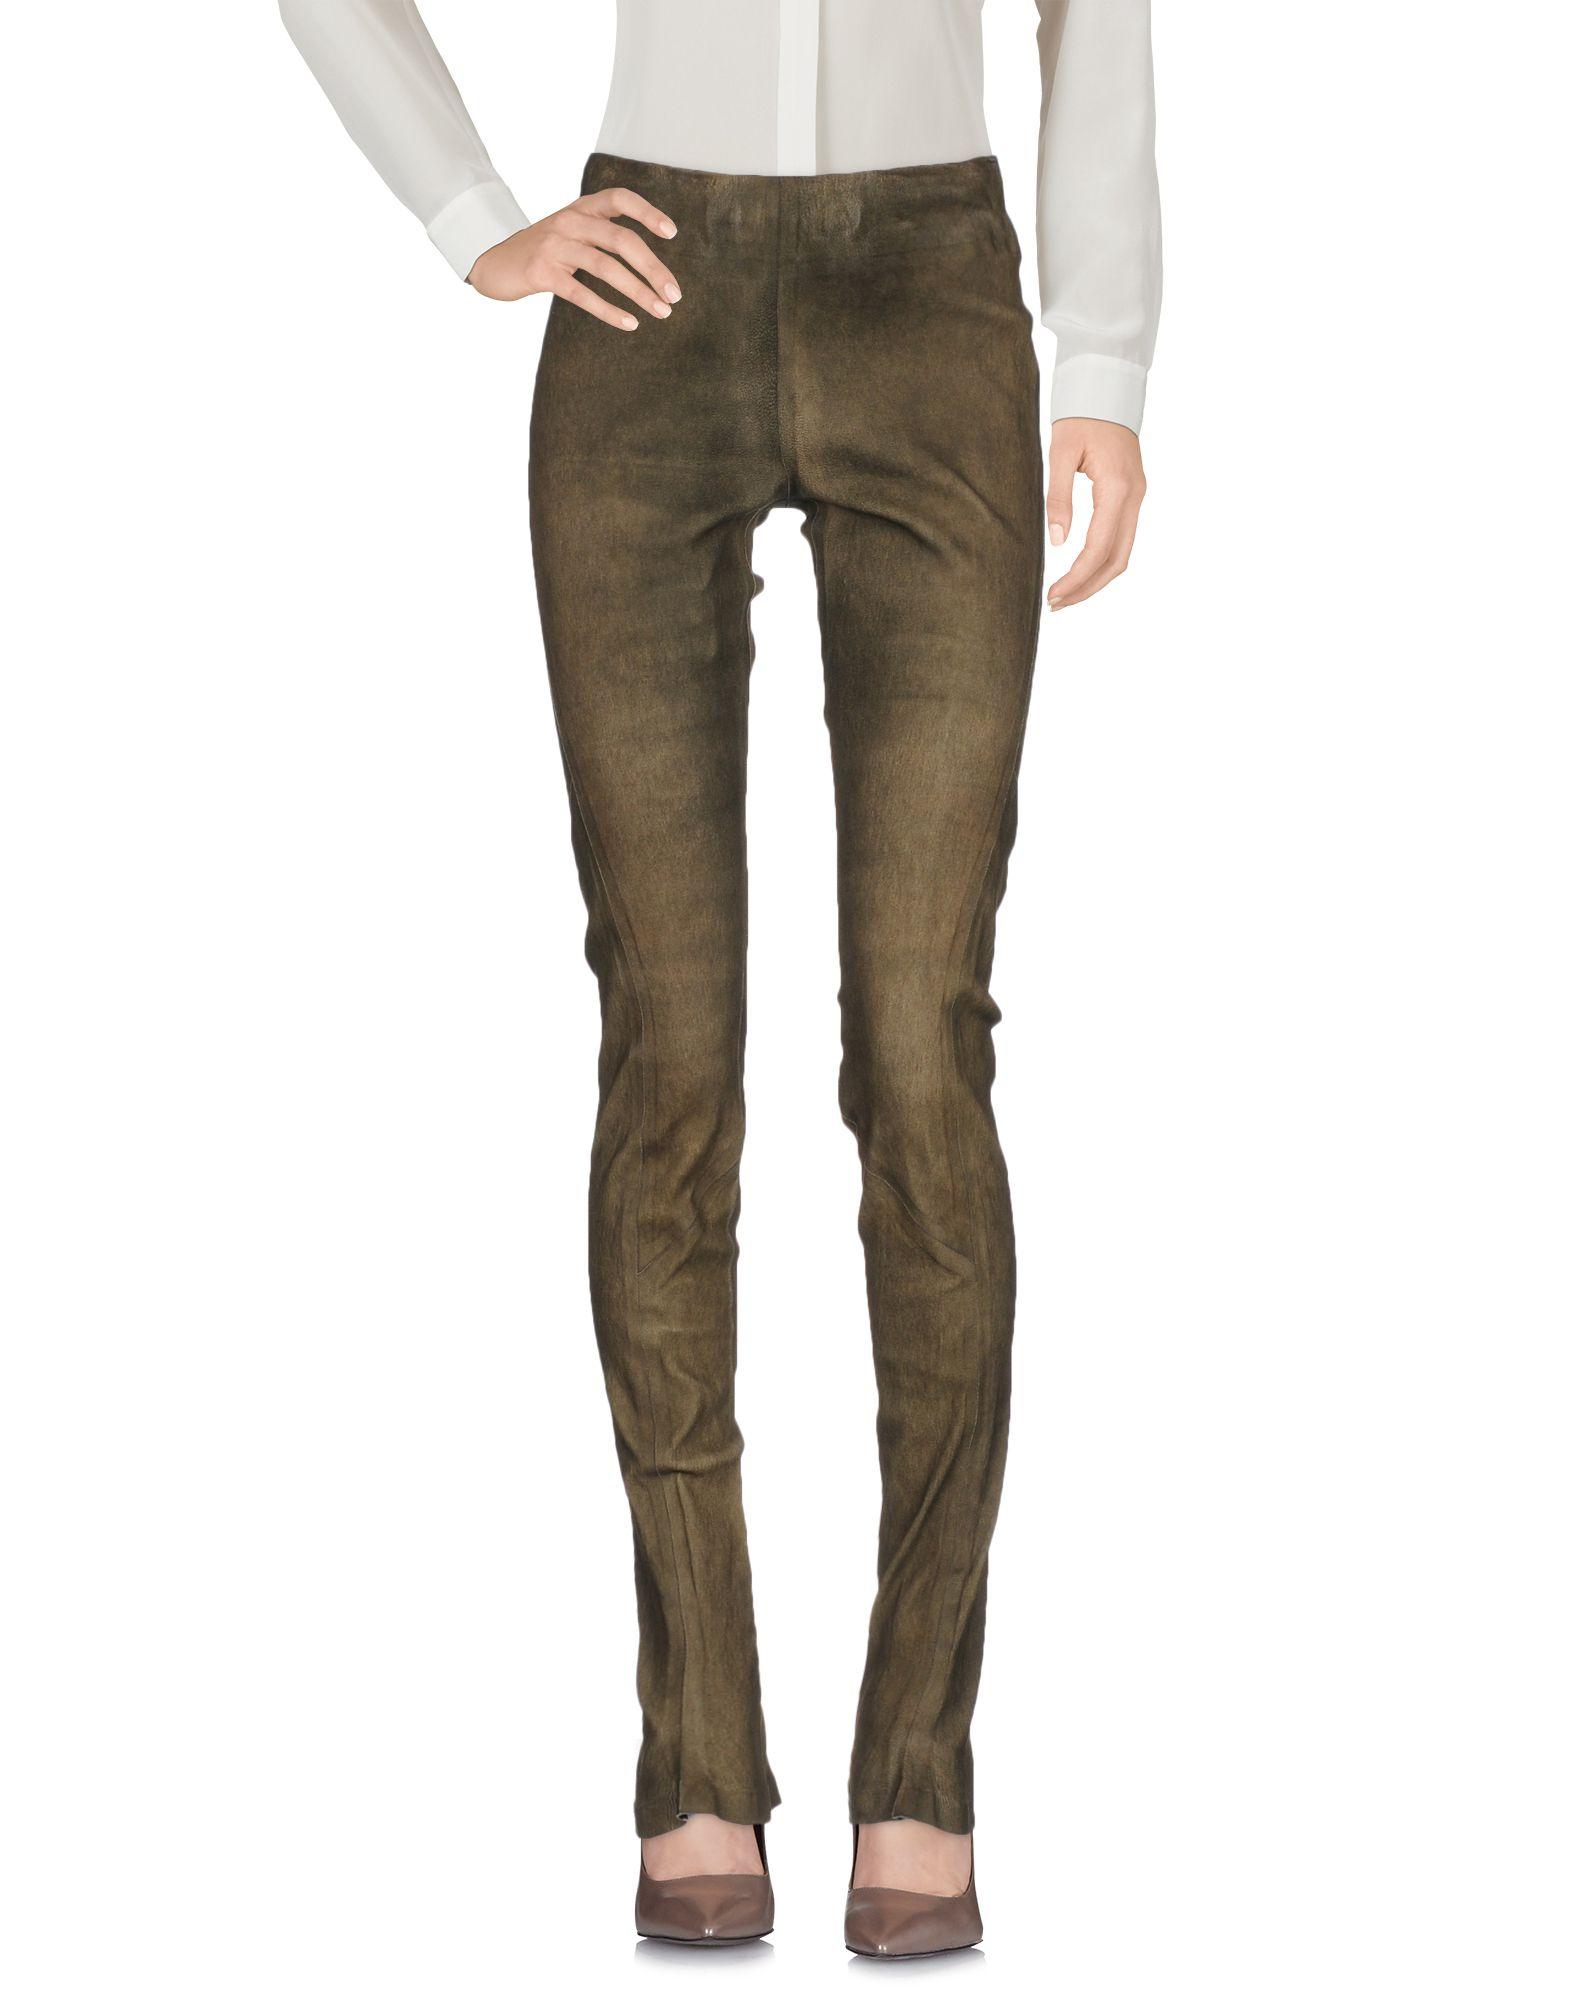 ISAAC SELLAM EXPERIENCE Повседневные брюки isaac sellam experience жилеты удлиненные